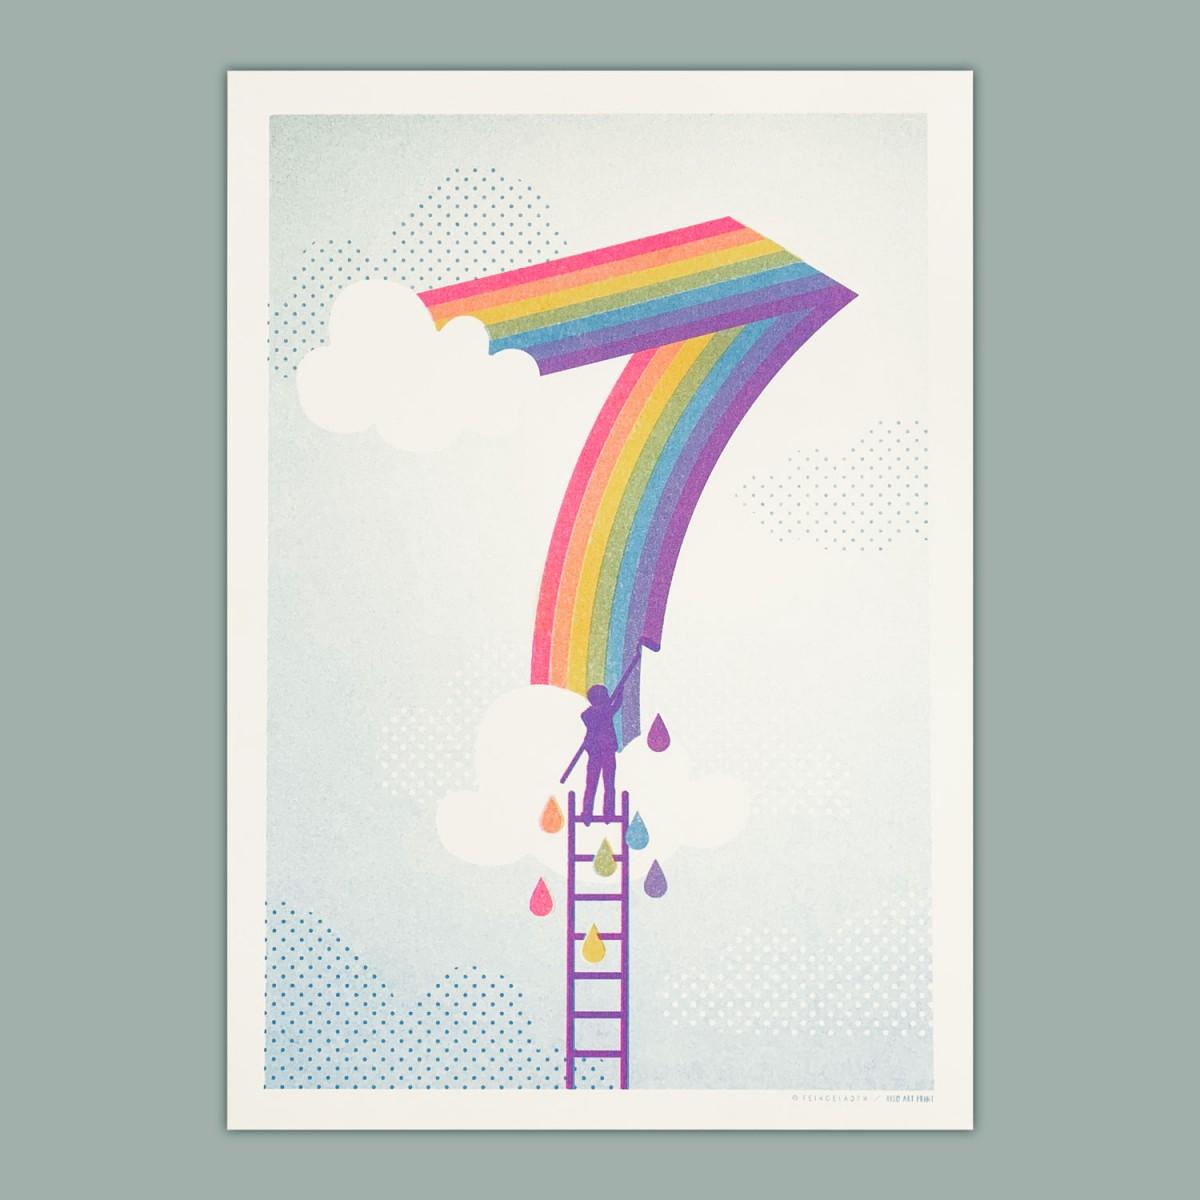 Feingeladen // NUMBERS // »Wolke Sieben« (FPSFAQ), RISO-Kunstdruck, A4